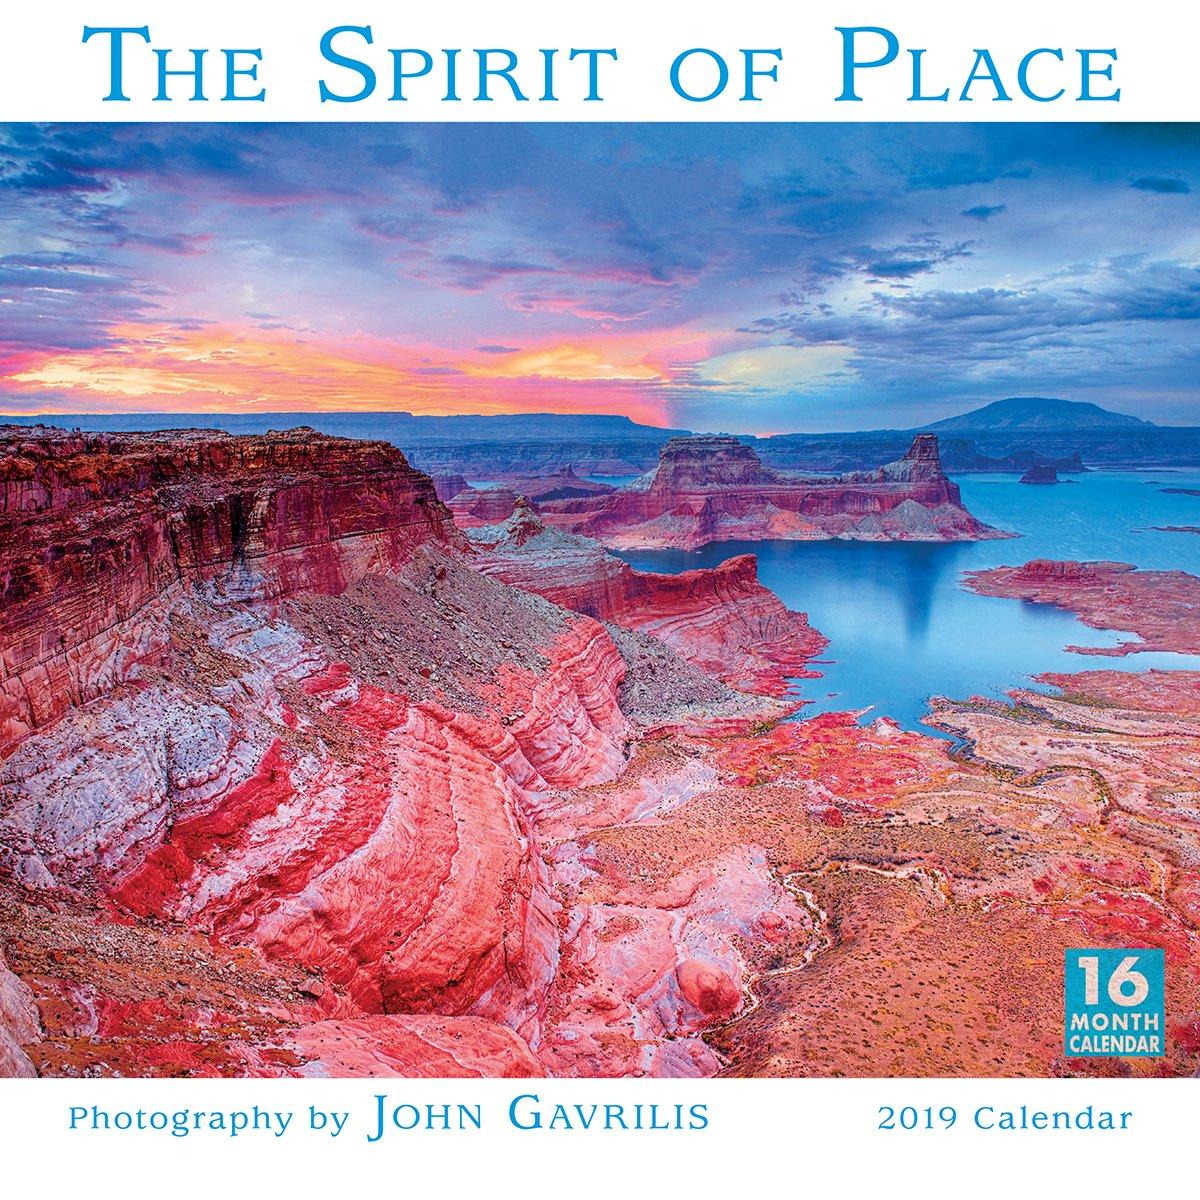 2019 The Spirit of Place 16-Month Wall Calendar: by Sellers Publishing, 12x12 (CA-0407) Calendar – Wall Calendar, Jun 22 2018 John Gavrilis Inc. 1531904076 /